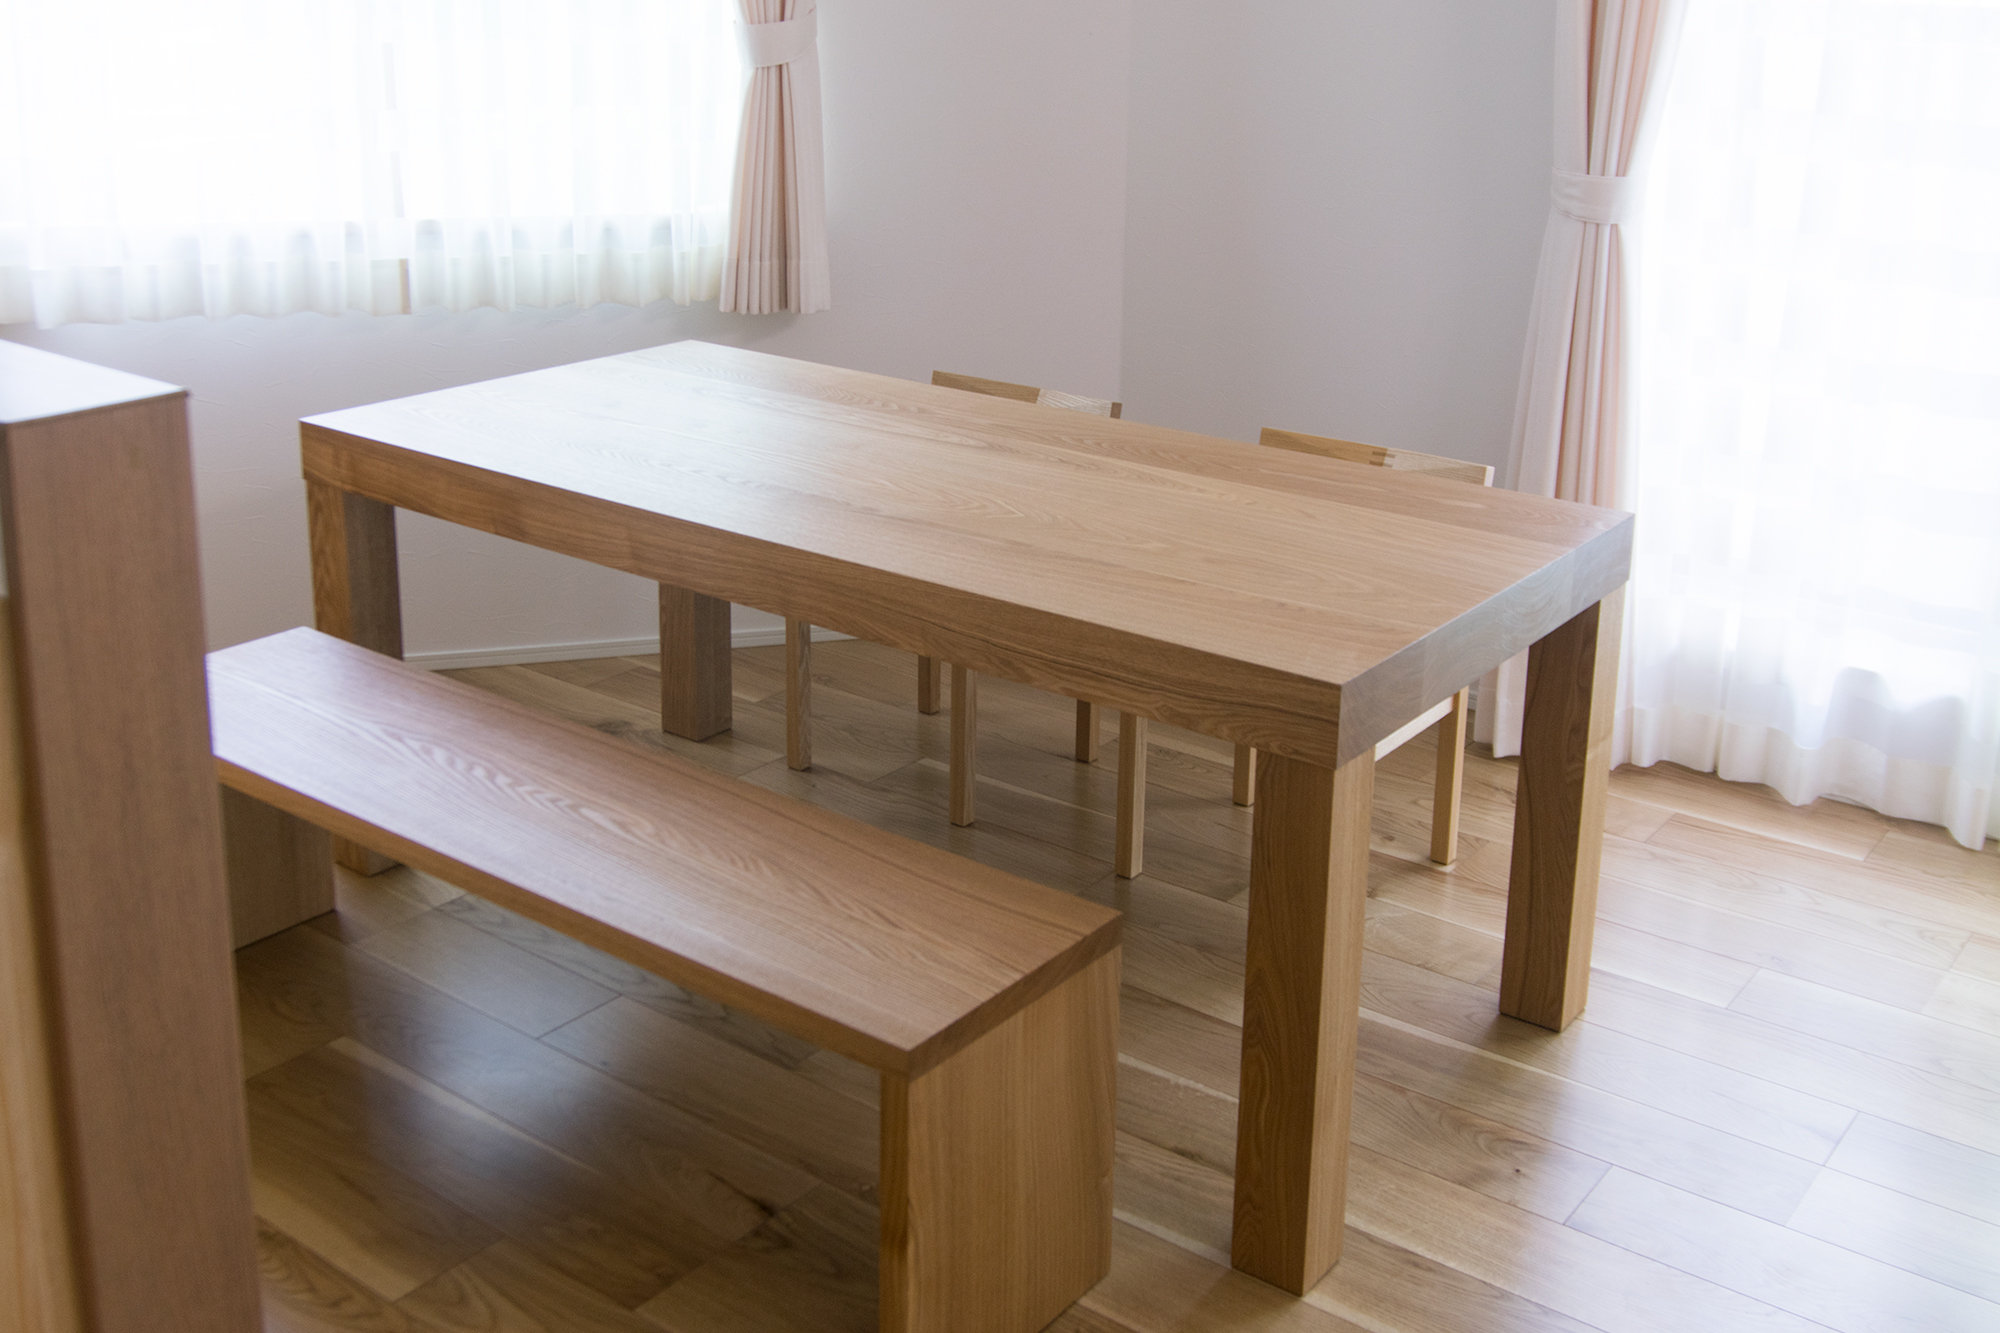 90mm厚の天板の厚みが特徴の無垢テーブル